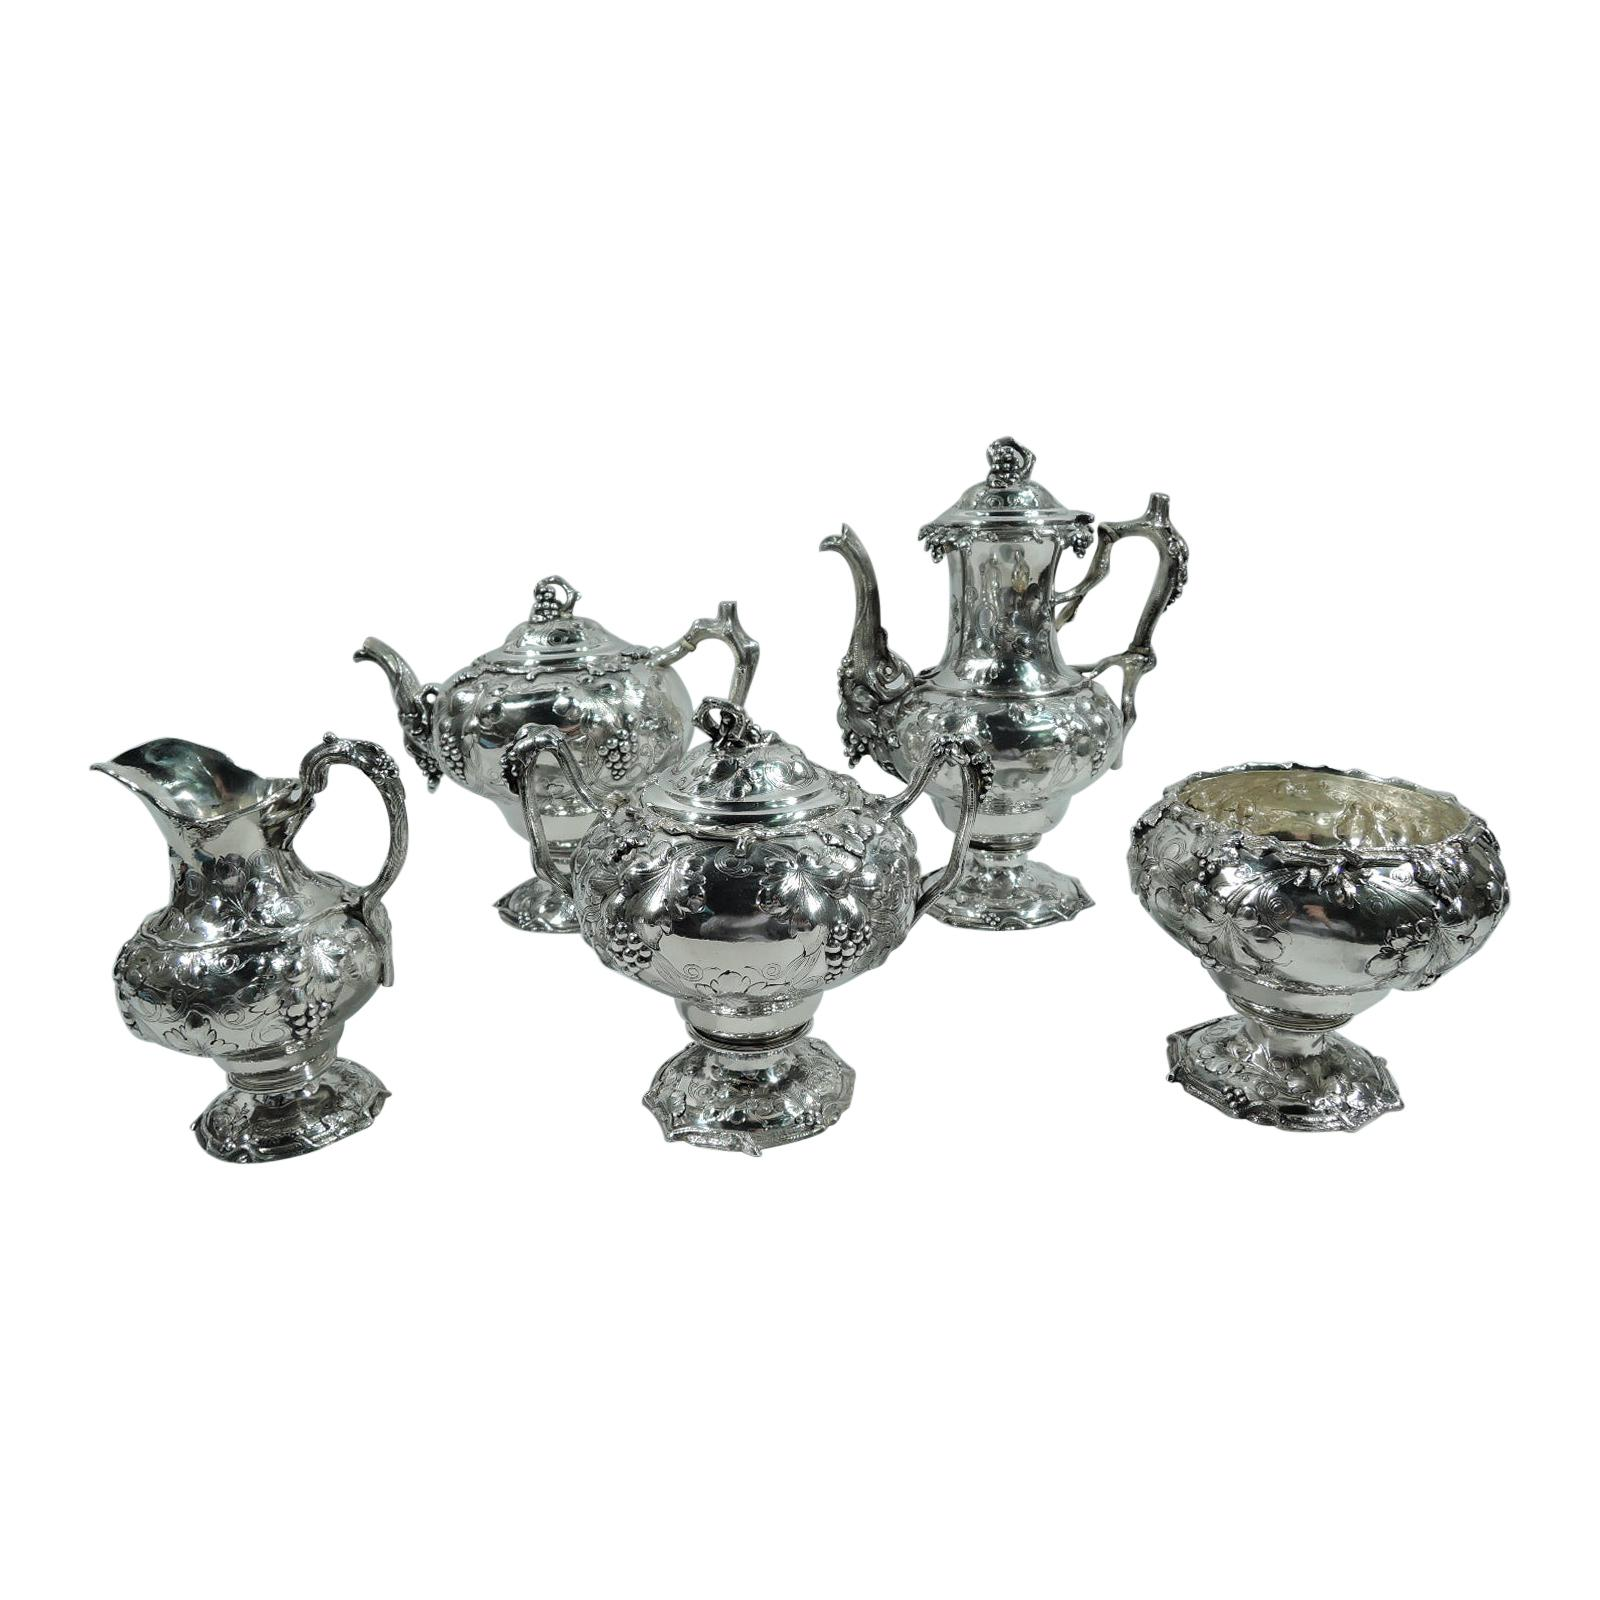 Early Tiffany Sterling Silver 5-Piece Grapevine Coffee & Tea Set